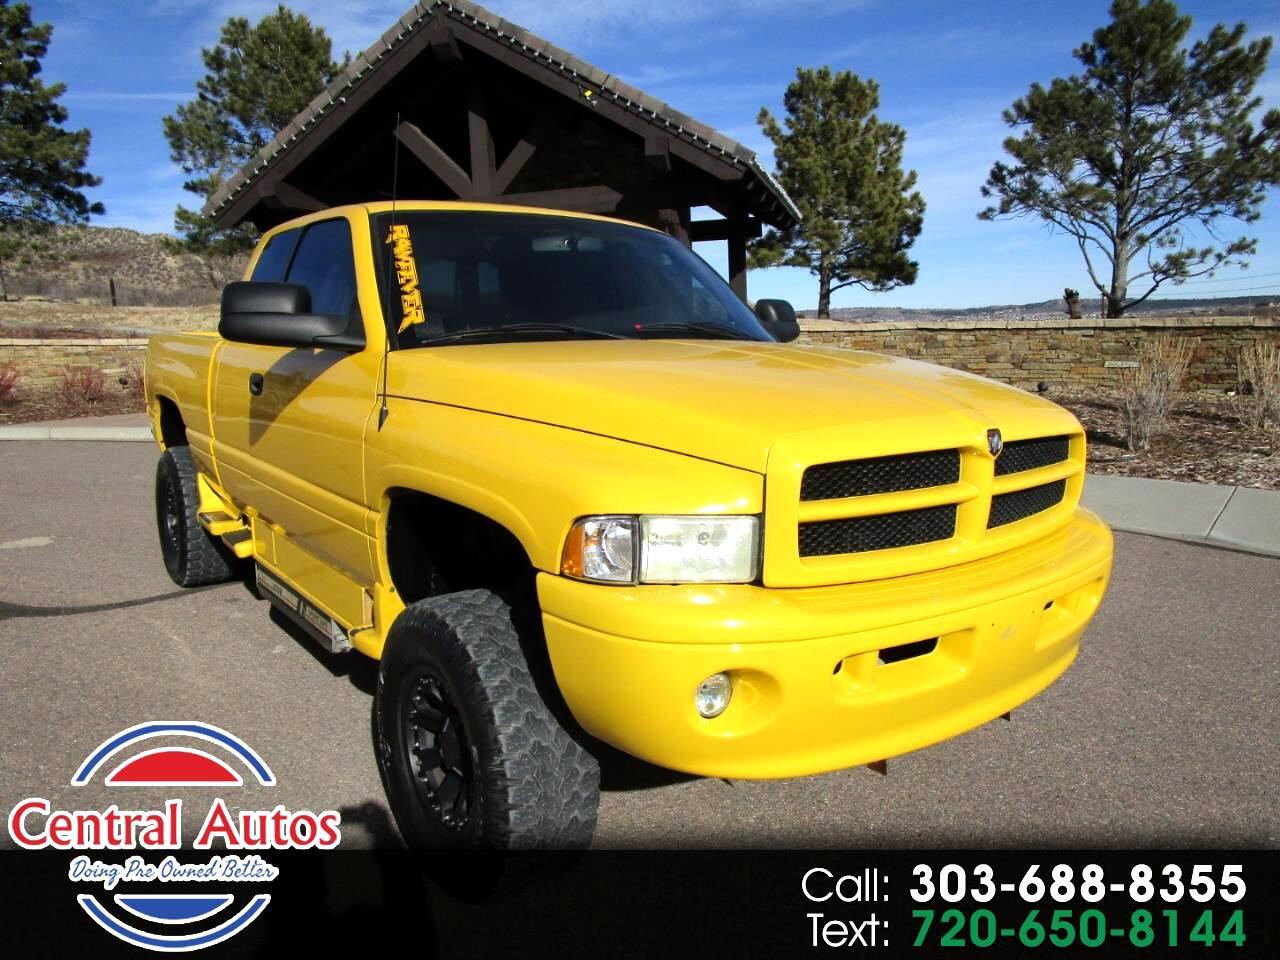 "2000 Dodge Ram 1500 4dr Quad Cab 139"" WB 4WD"